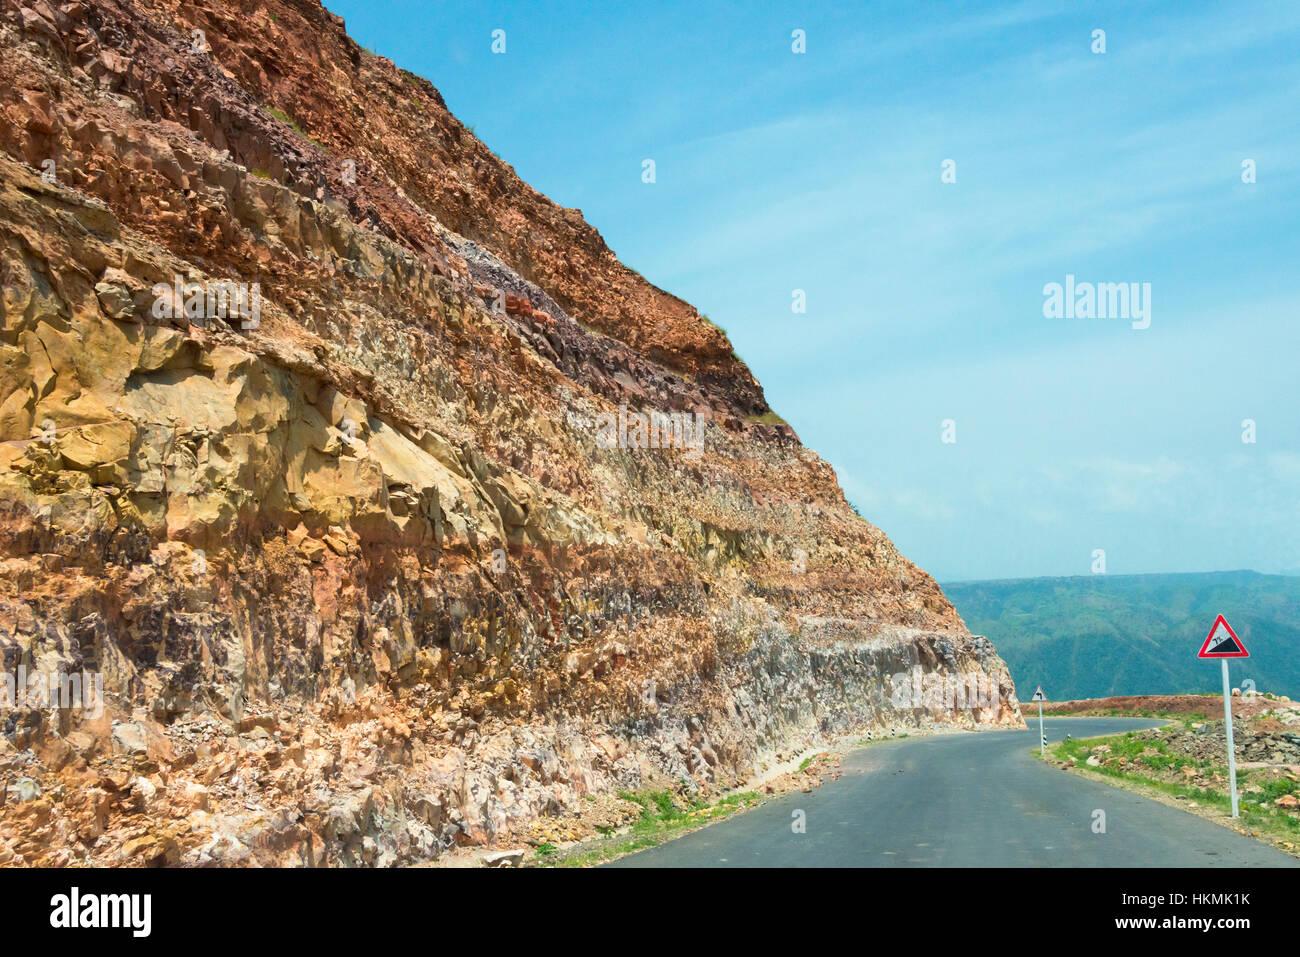 Cliff lungo la superstrada, Simien Mountain, Etiopia Immagini Stock